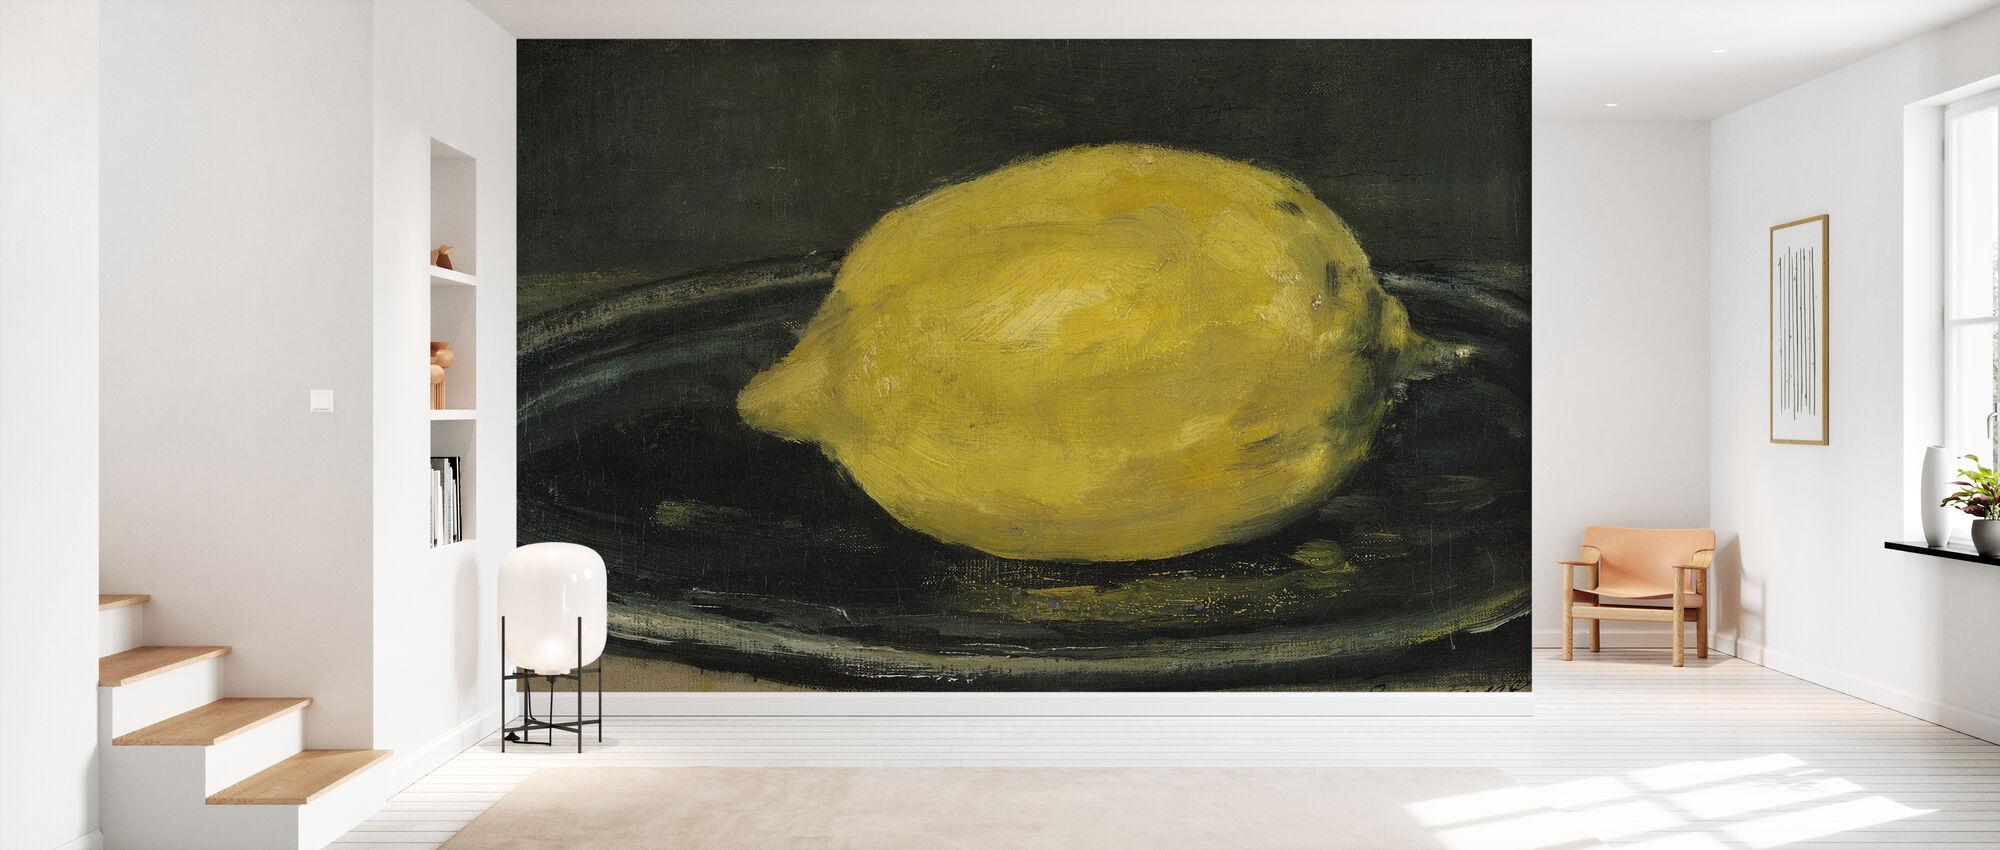 Zitrone, Edouard Manet - Tapete - Flur